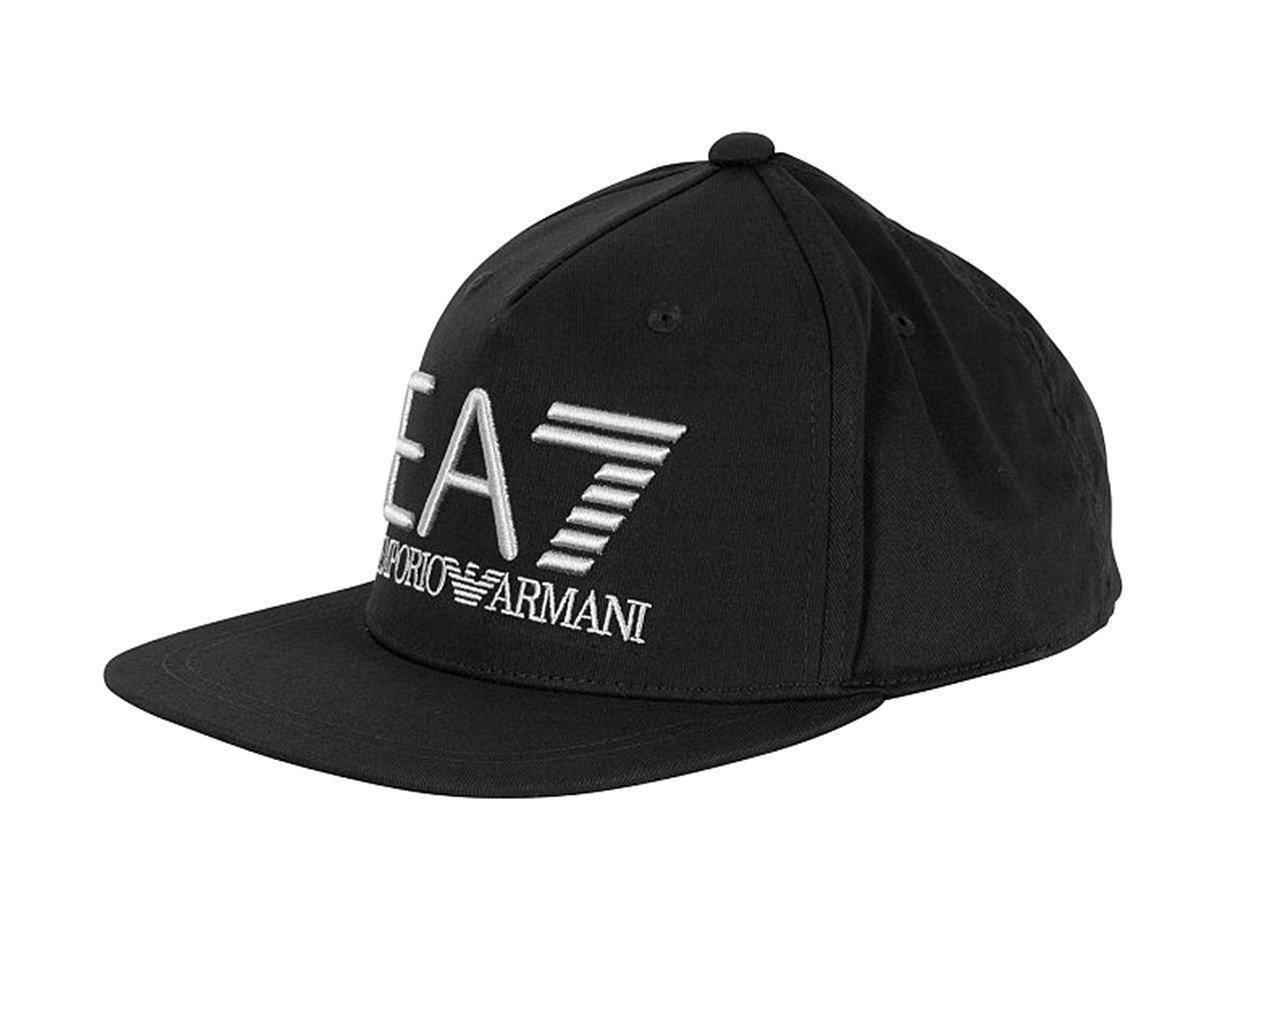 Emporio Armani Train Visibility Rapper Cap Black in Black for Men - Lyst 942d1c41b13b